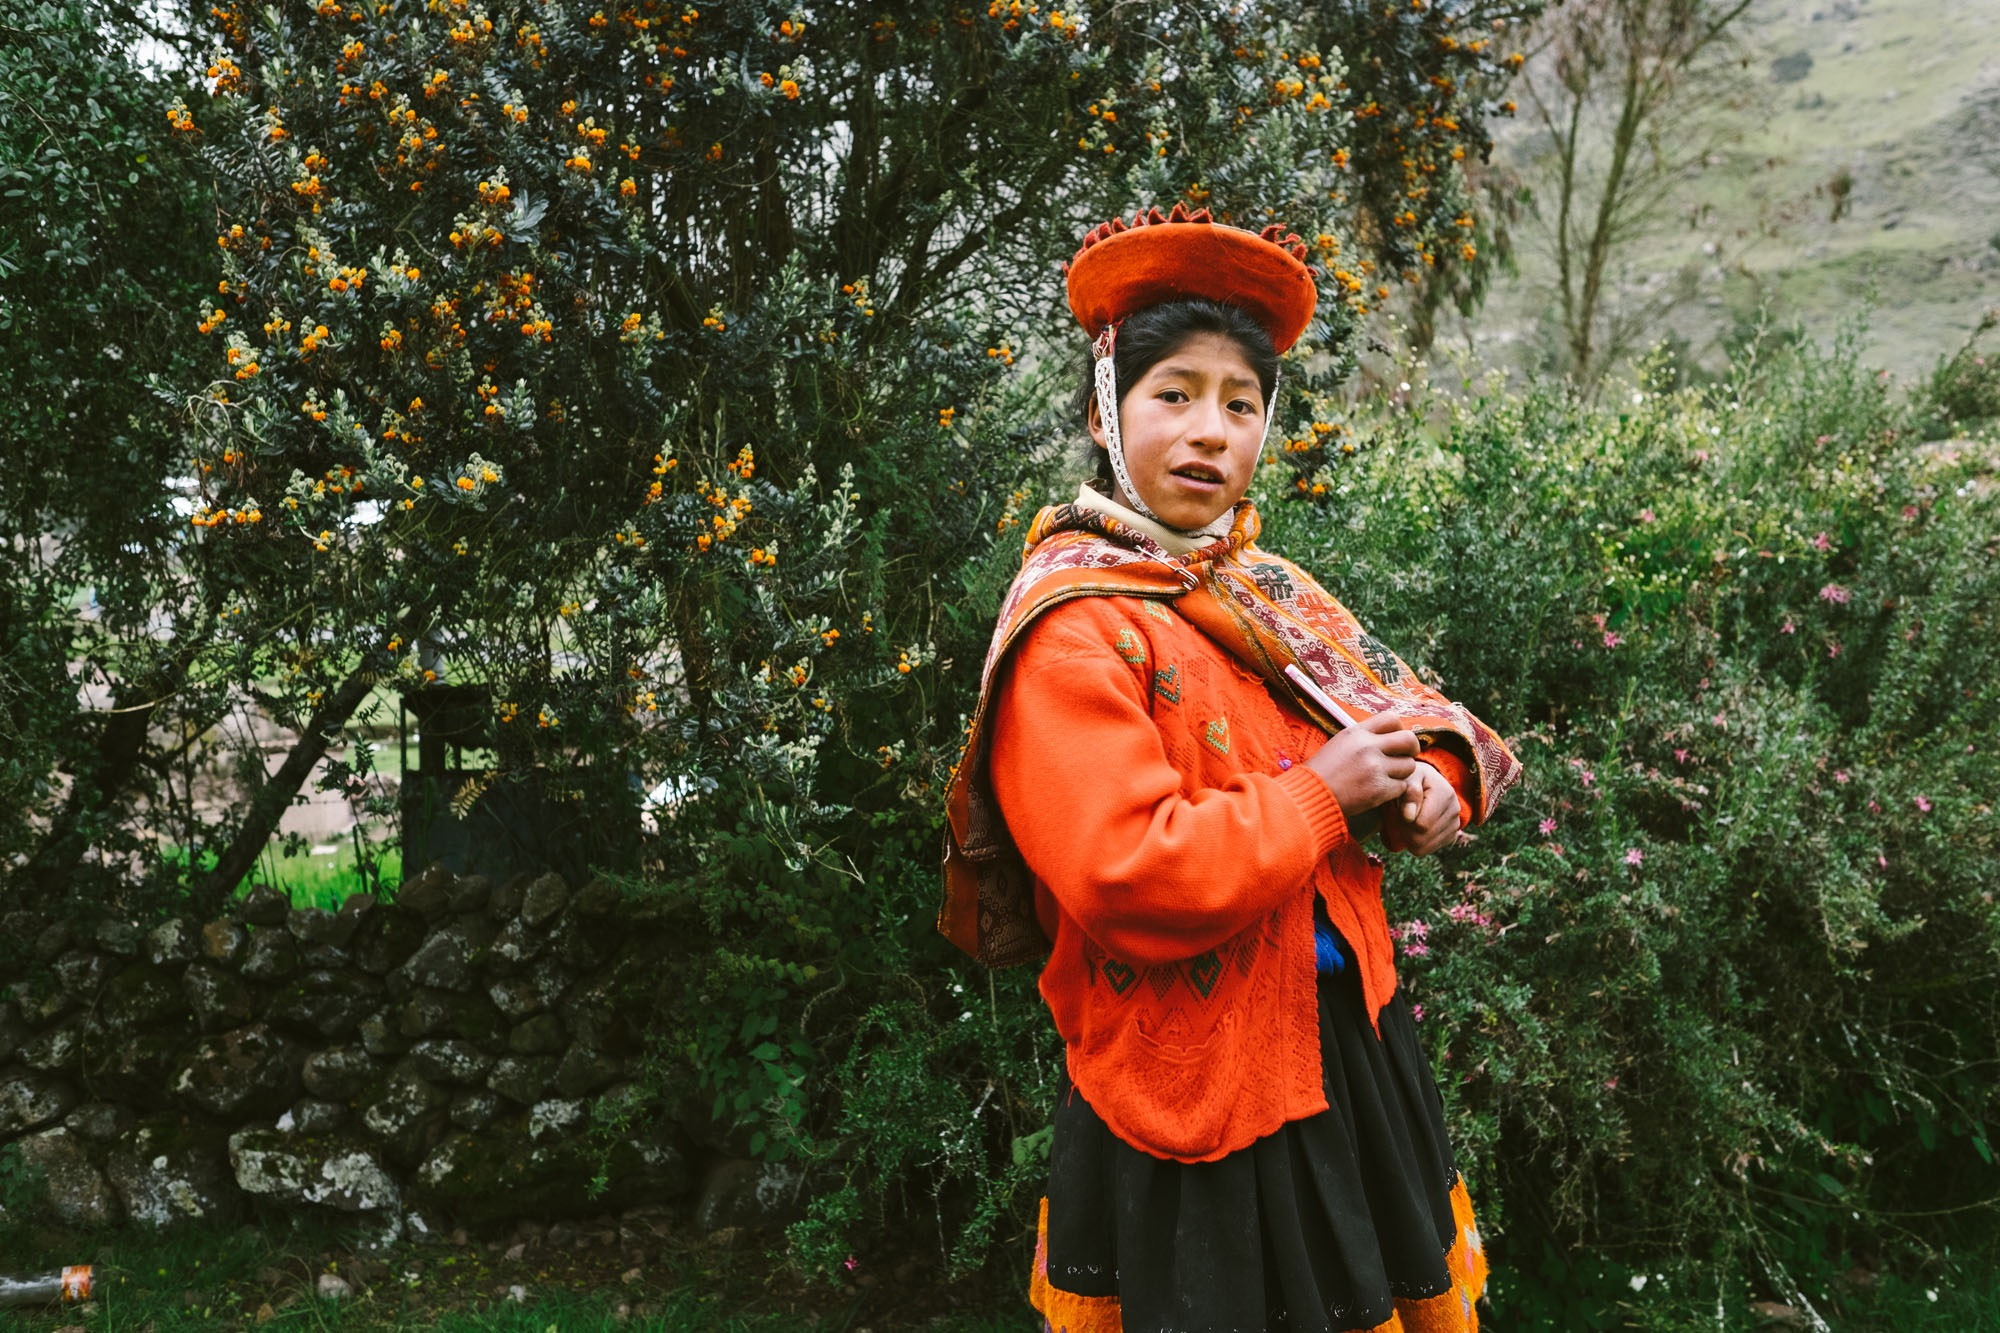 JenniferEmerling_Peru_Andes06.jpg